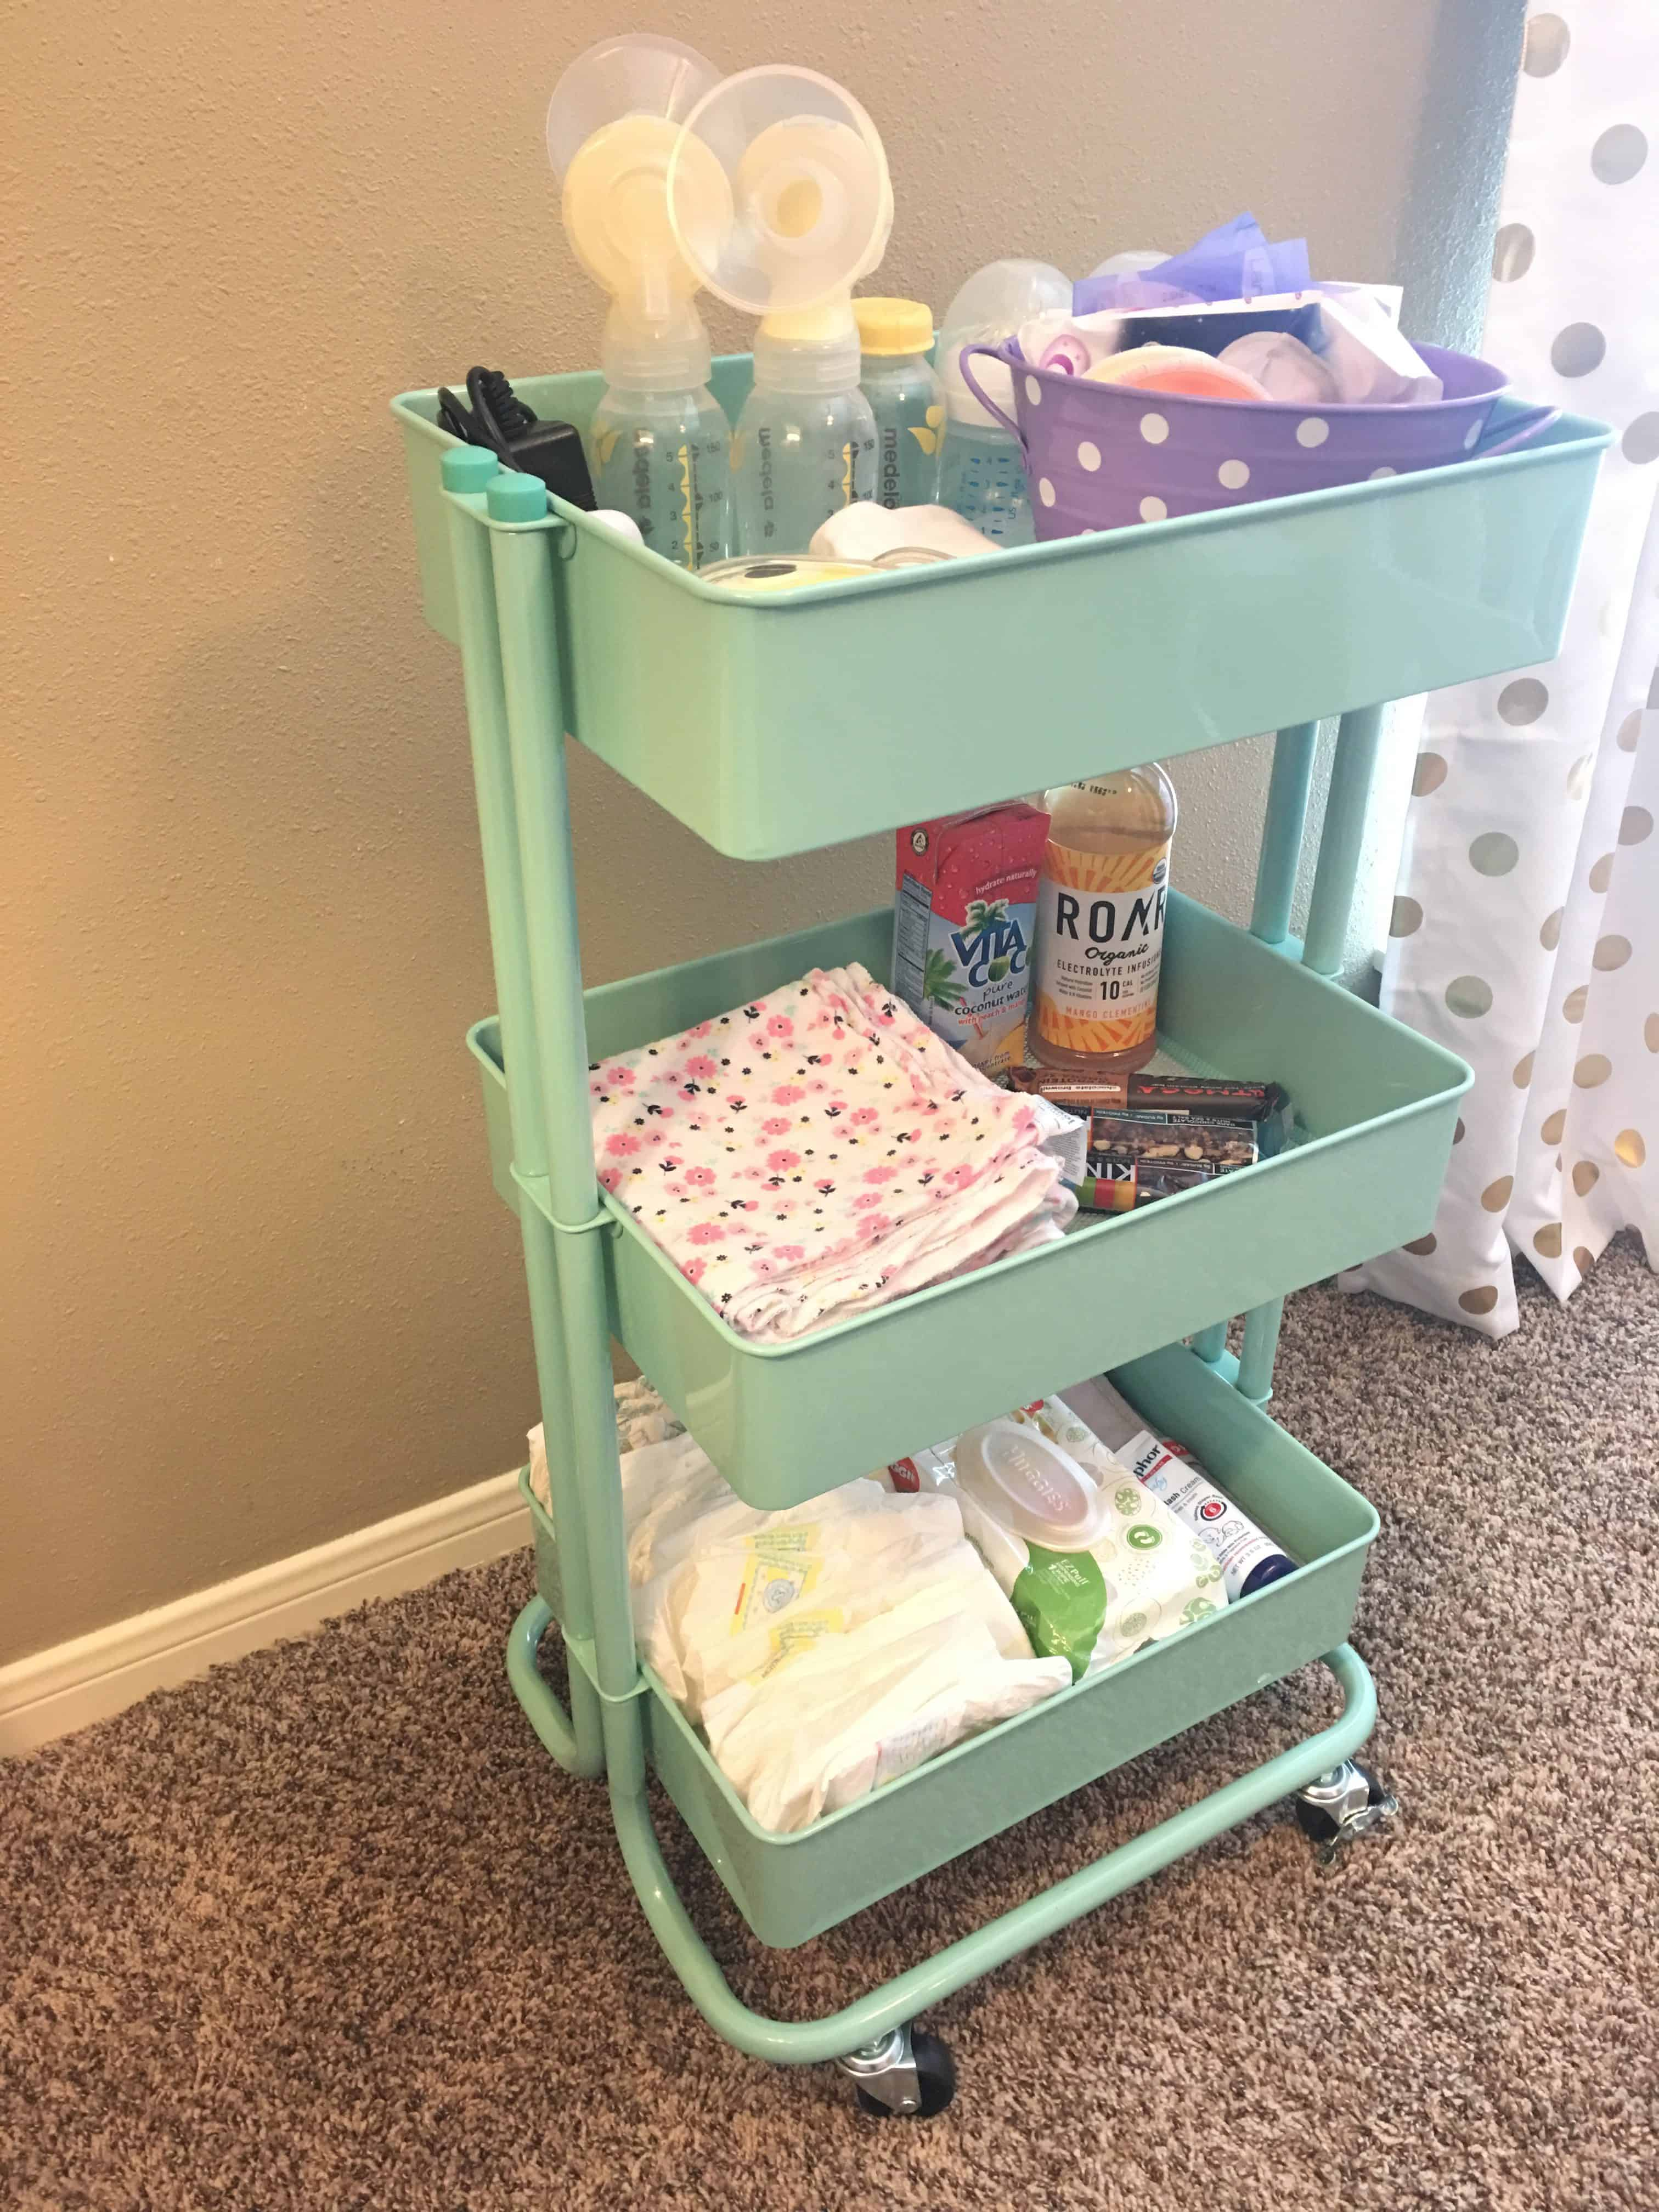 Breastfeeding and Pumping Cart